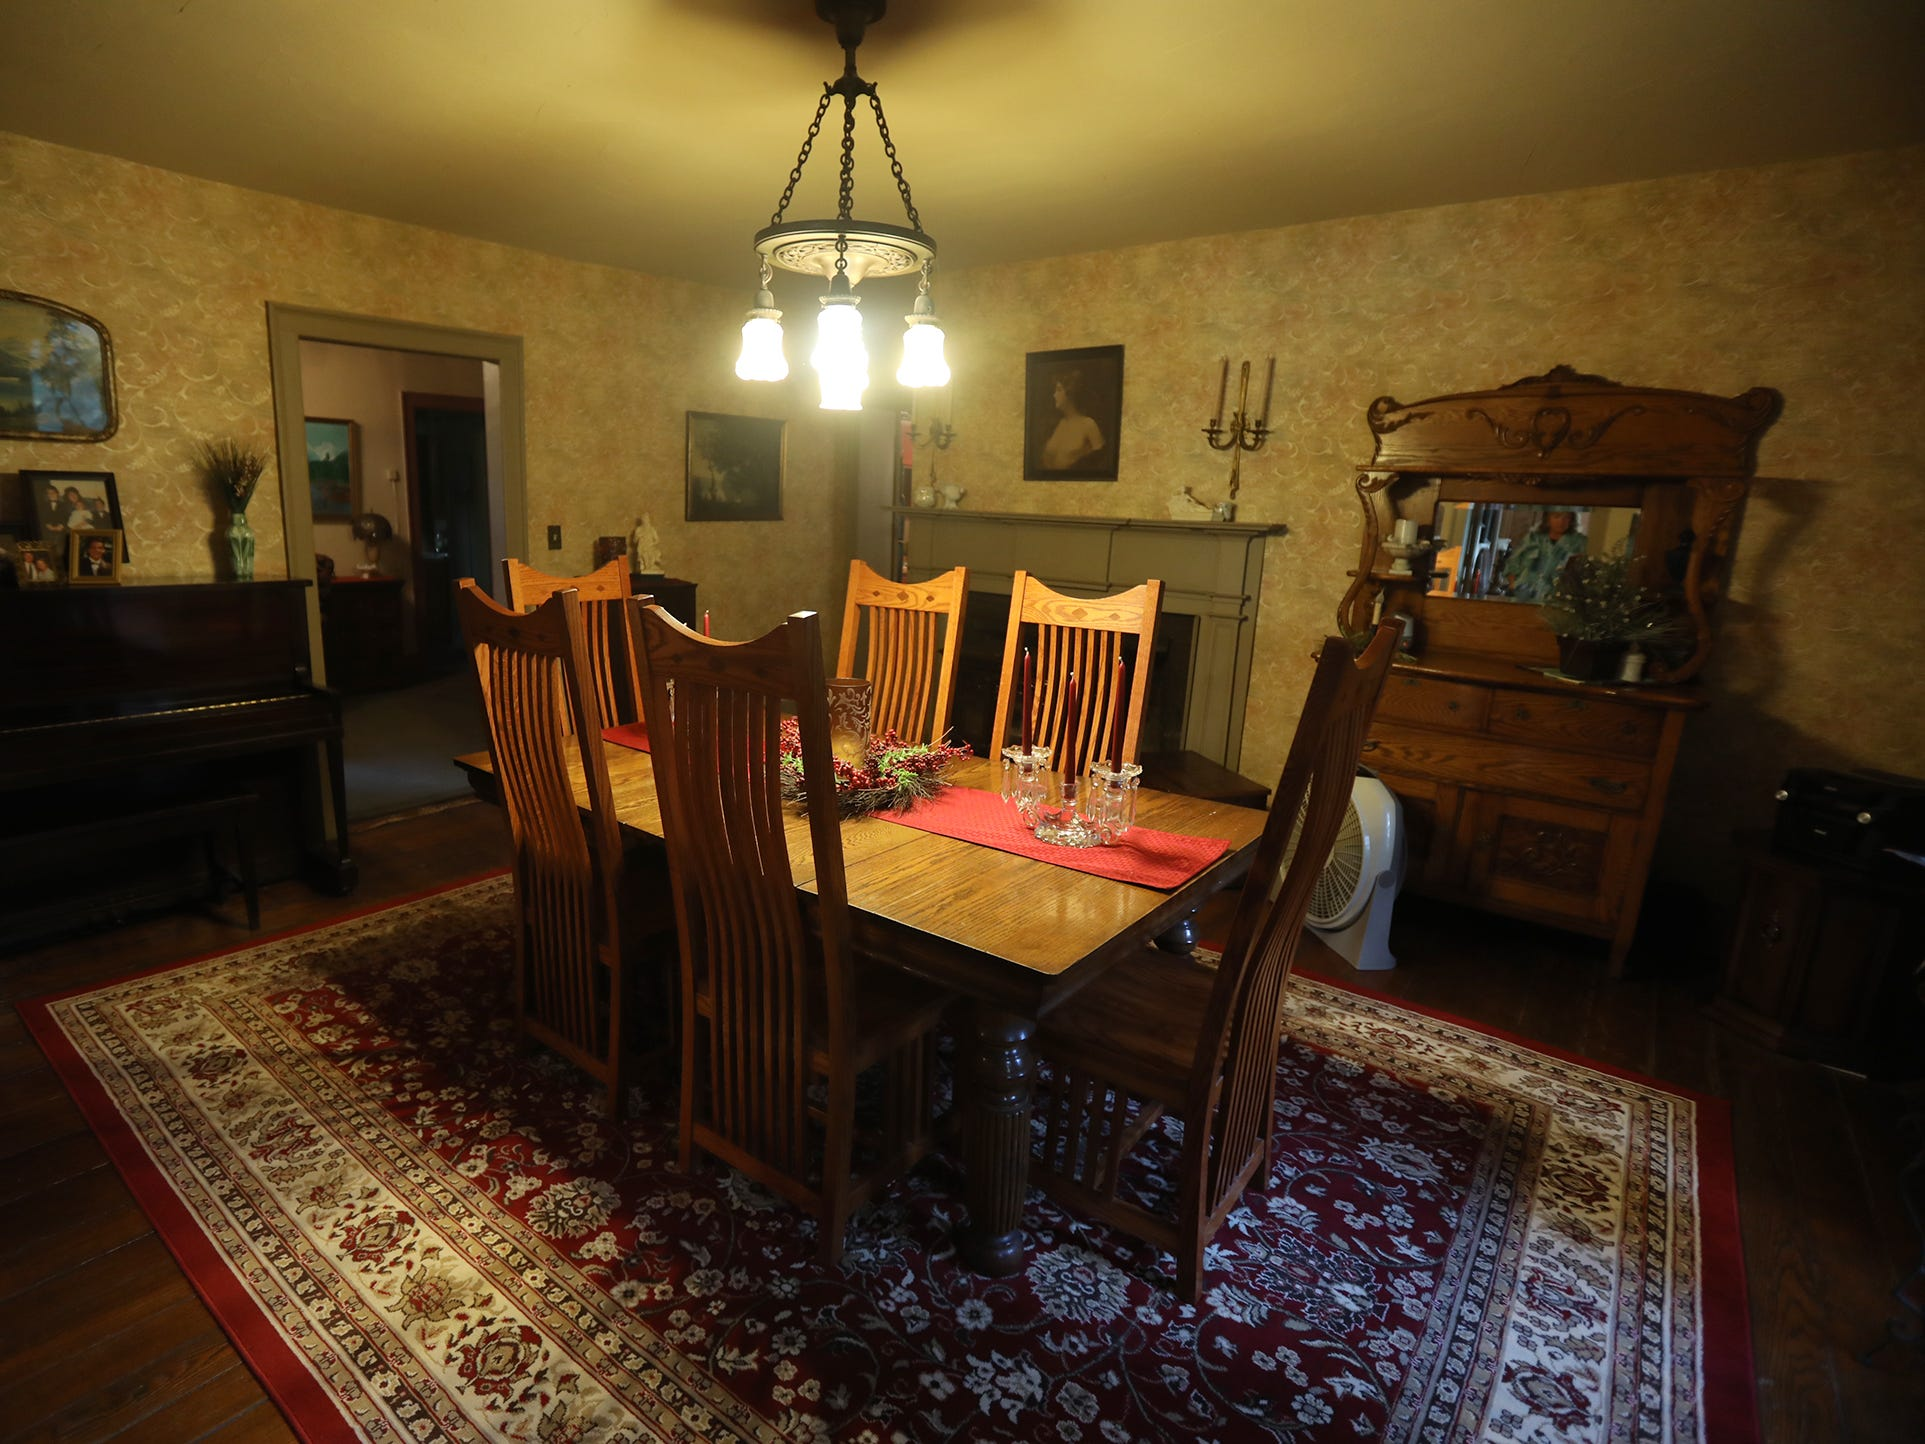 The dining room has original chestnut floors.